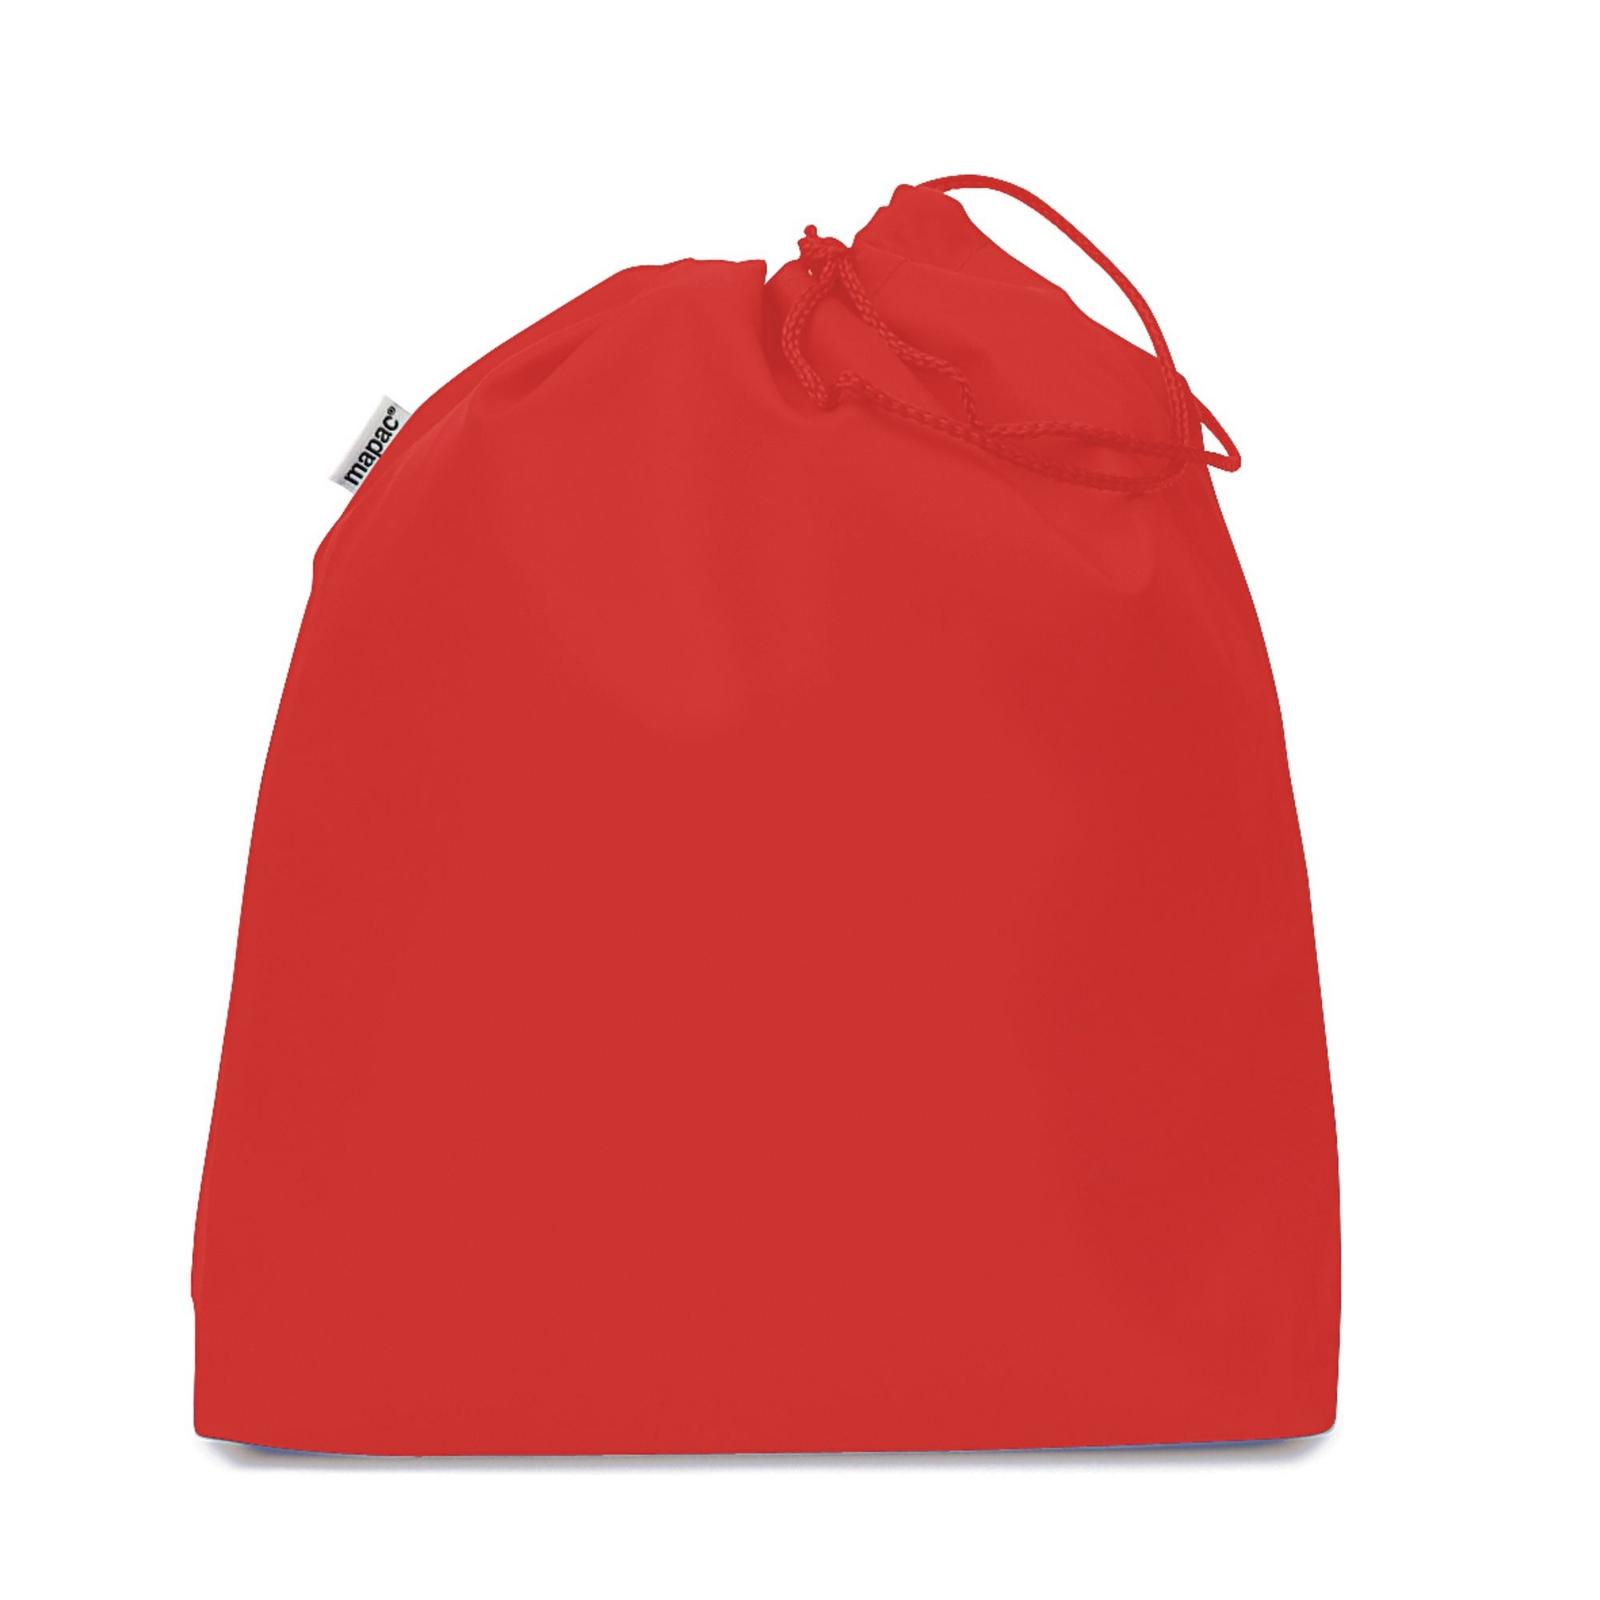 Plain Gym Bag Red - Pack of 25